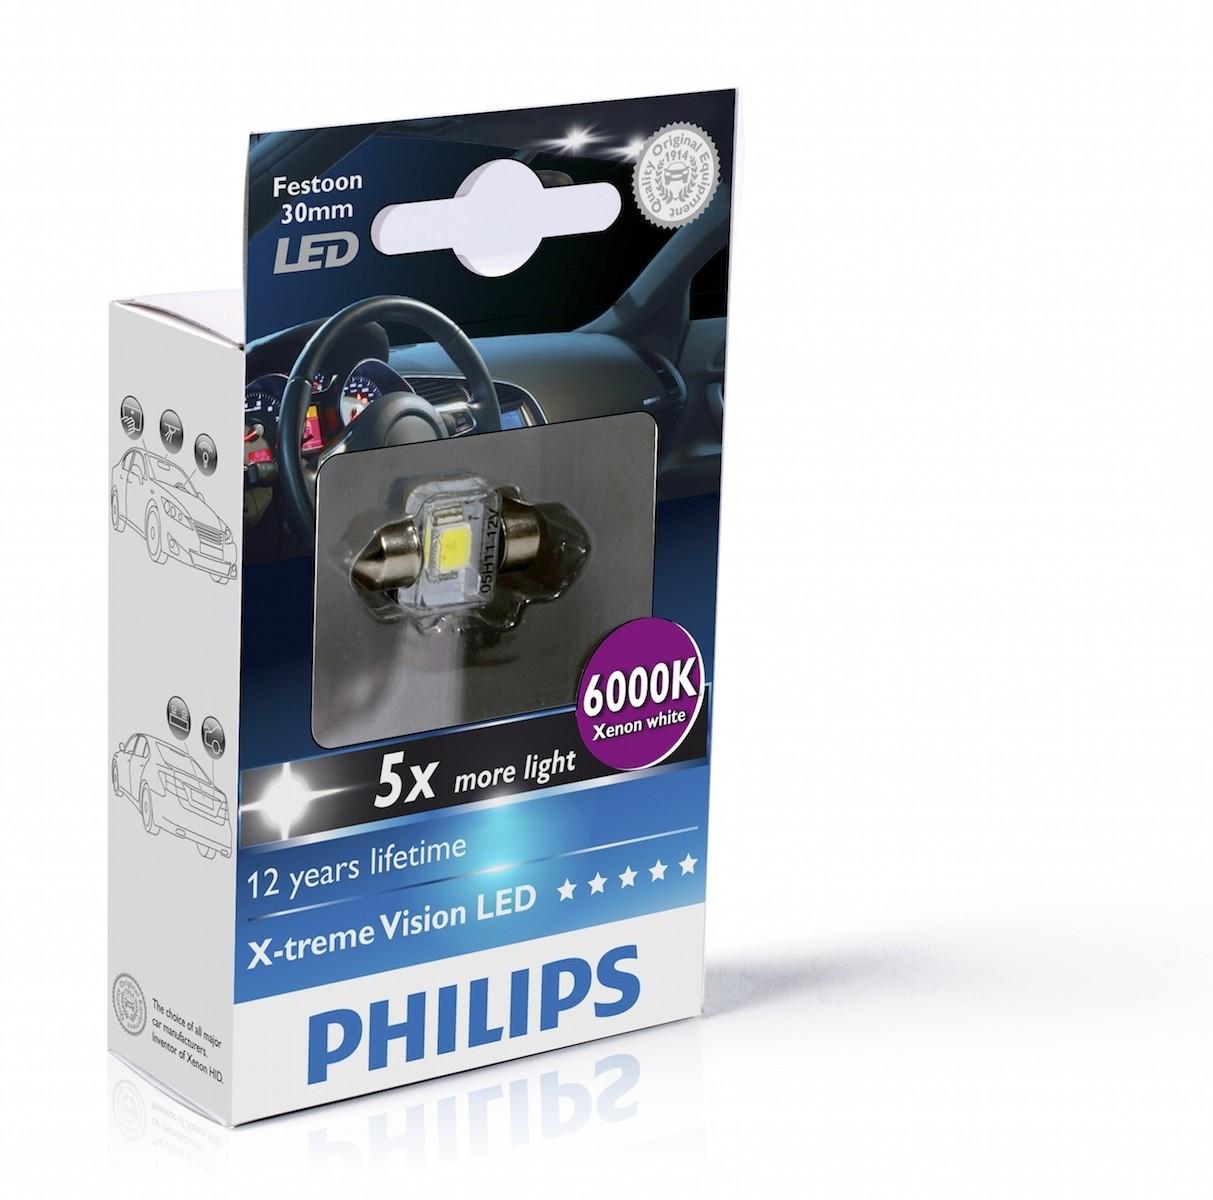 Philips PHILIPS Festoon 12V 1W SV8,5 X-tremeVision LED T14x30 6000K